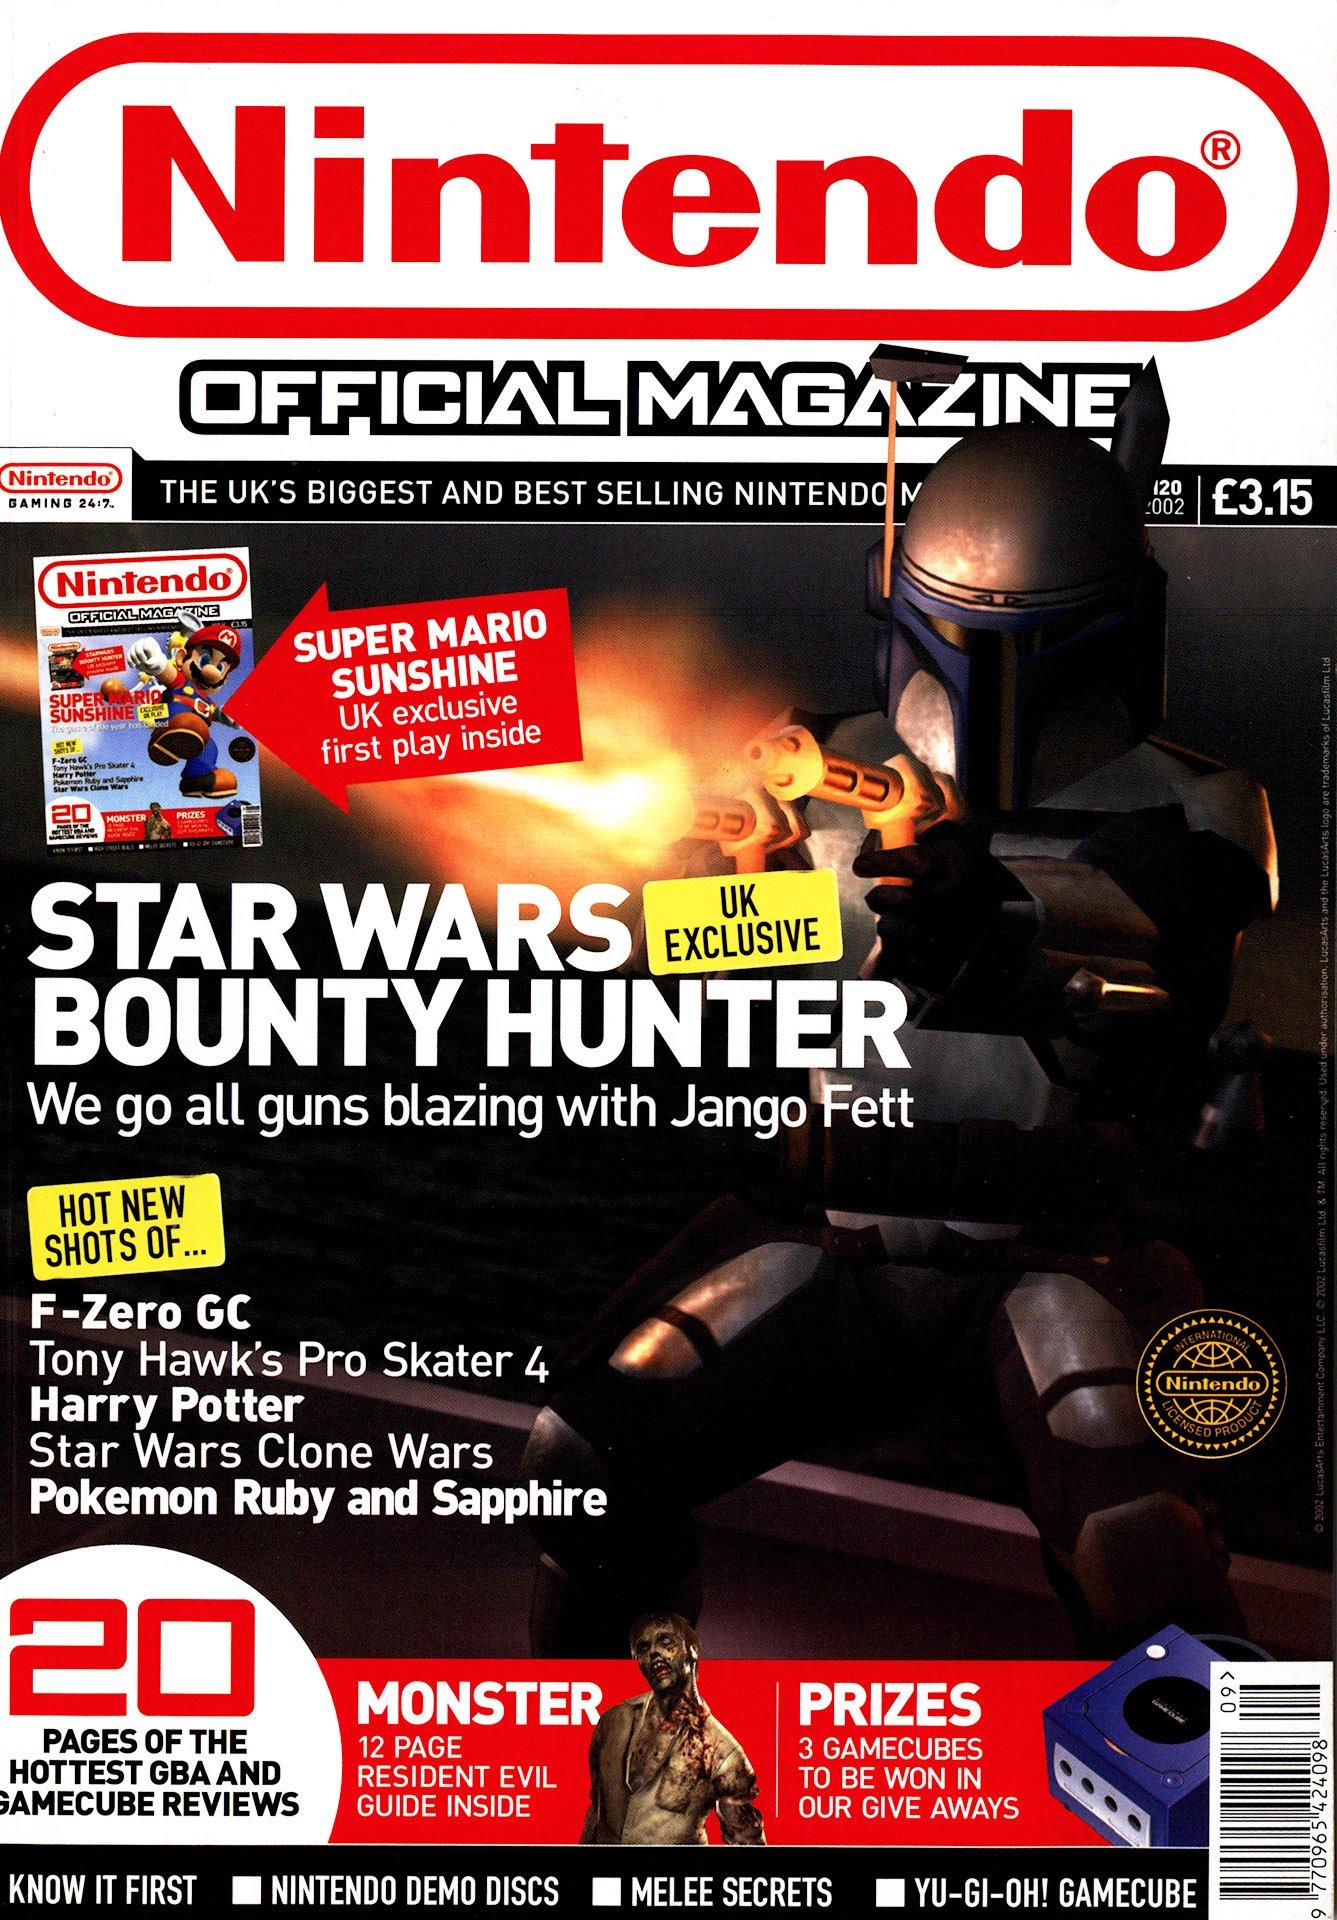 Nintendo Official Magazine 120 (September 2002) (cover 2)